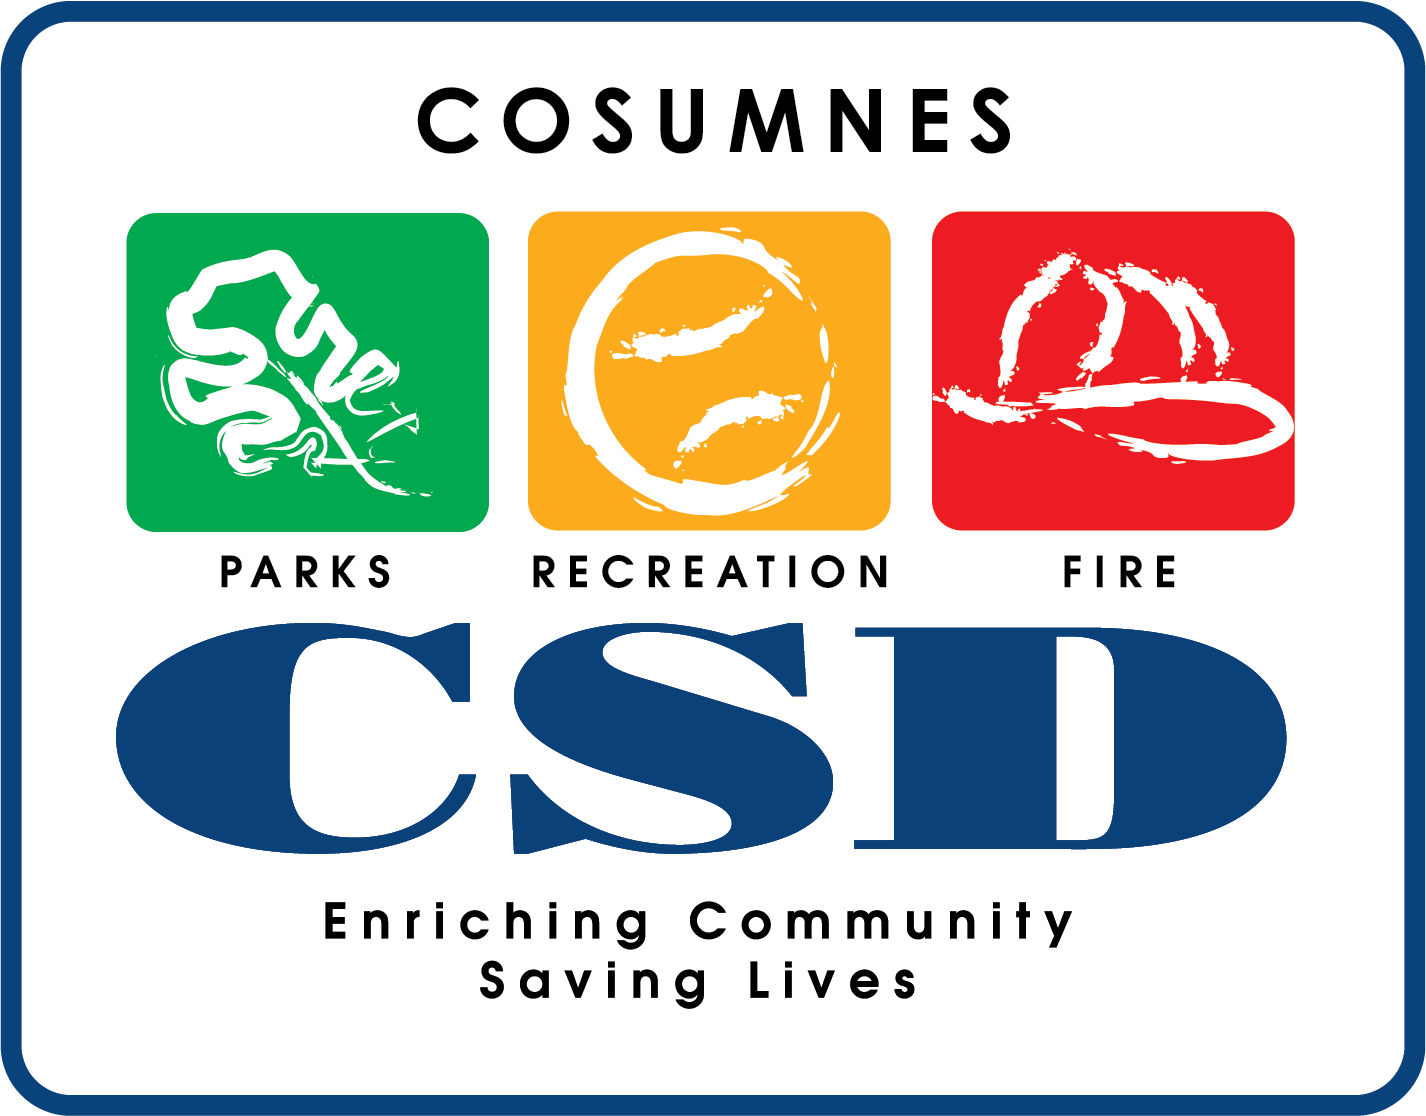 Cosumnes Community Services (CSD) logo - 2021